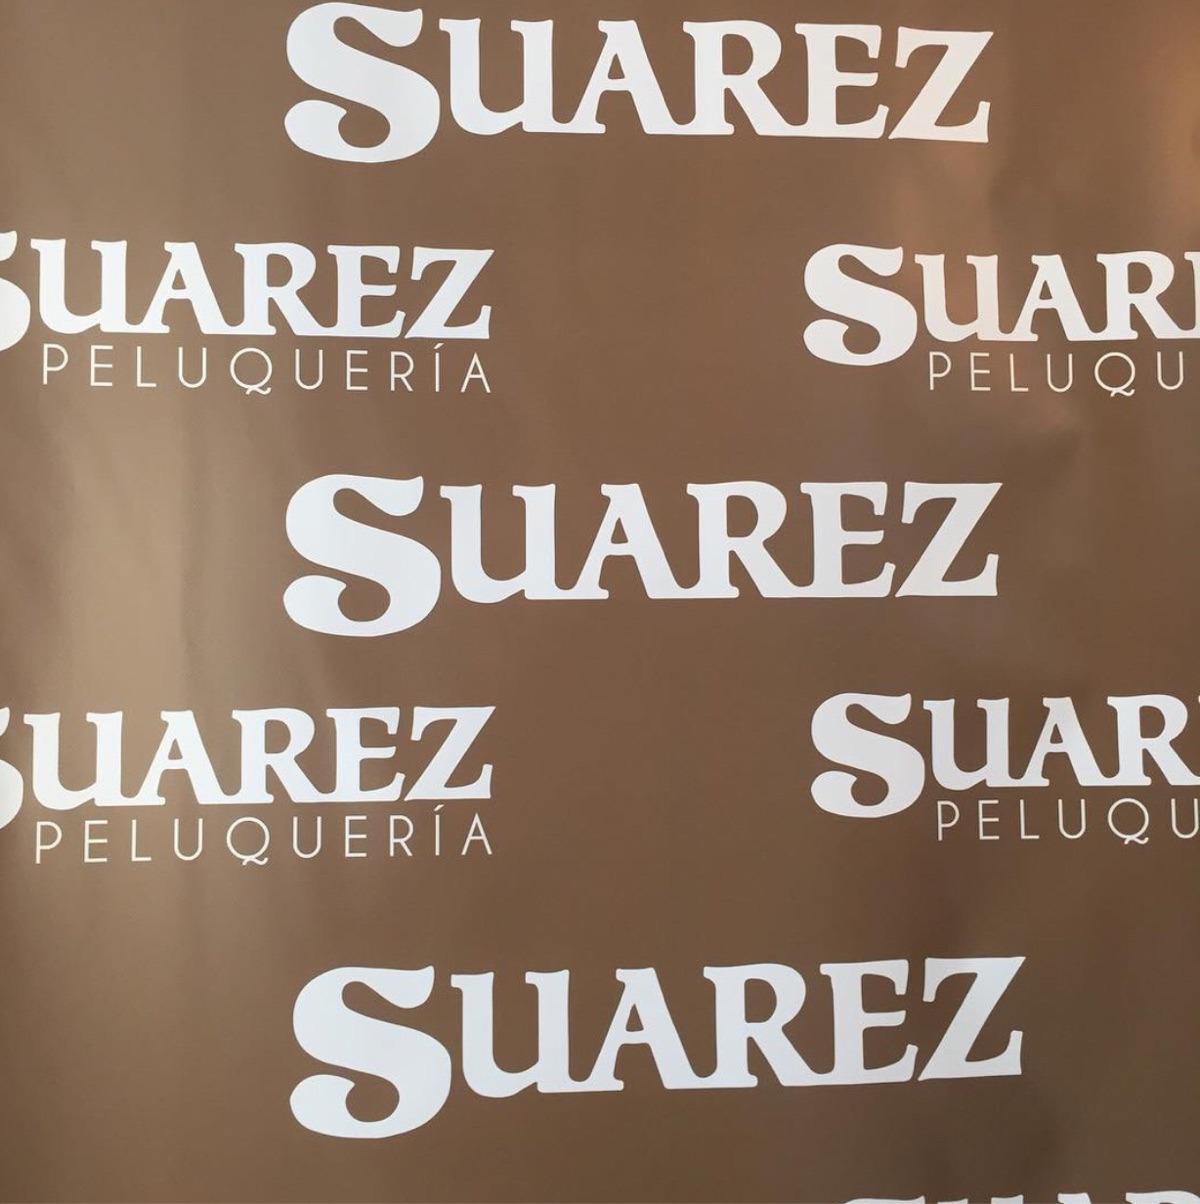 Julio Cesar Suárez Rodríguez  (@peluqueriasuarez) Cover Image